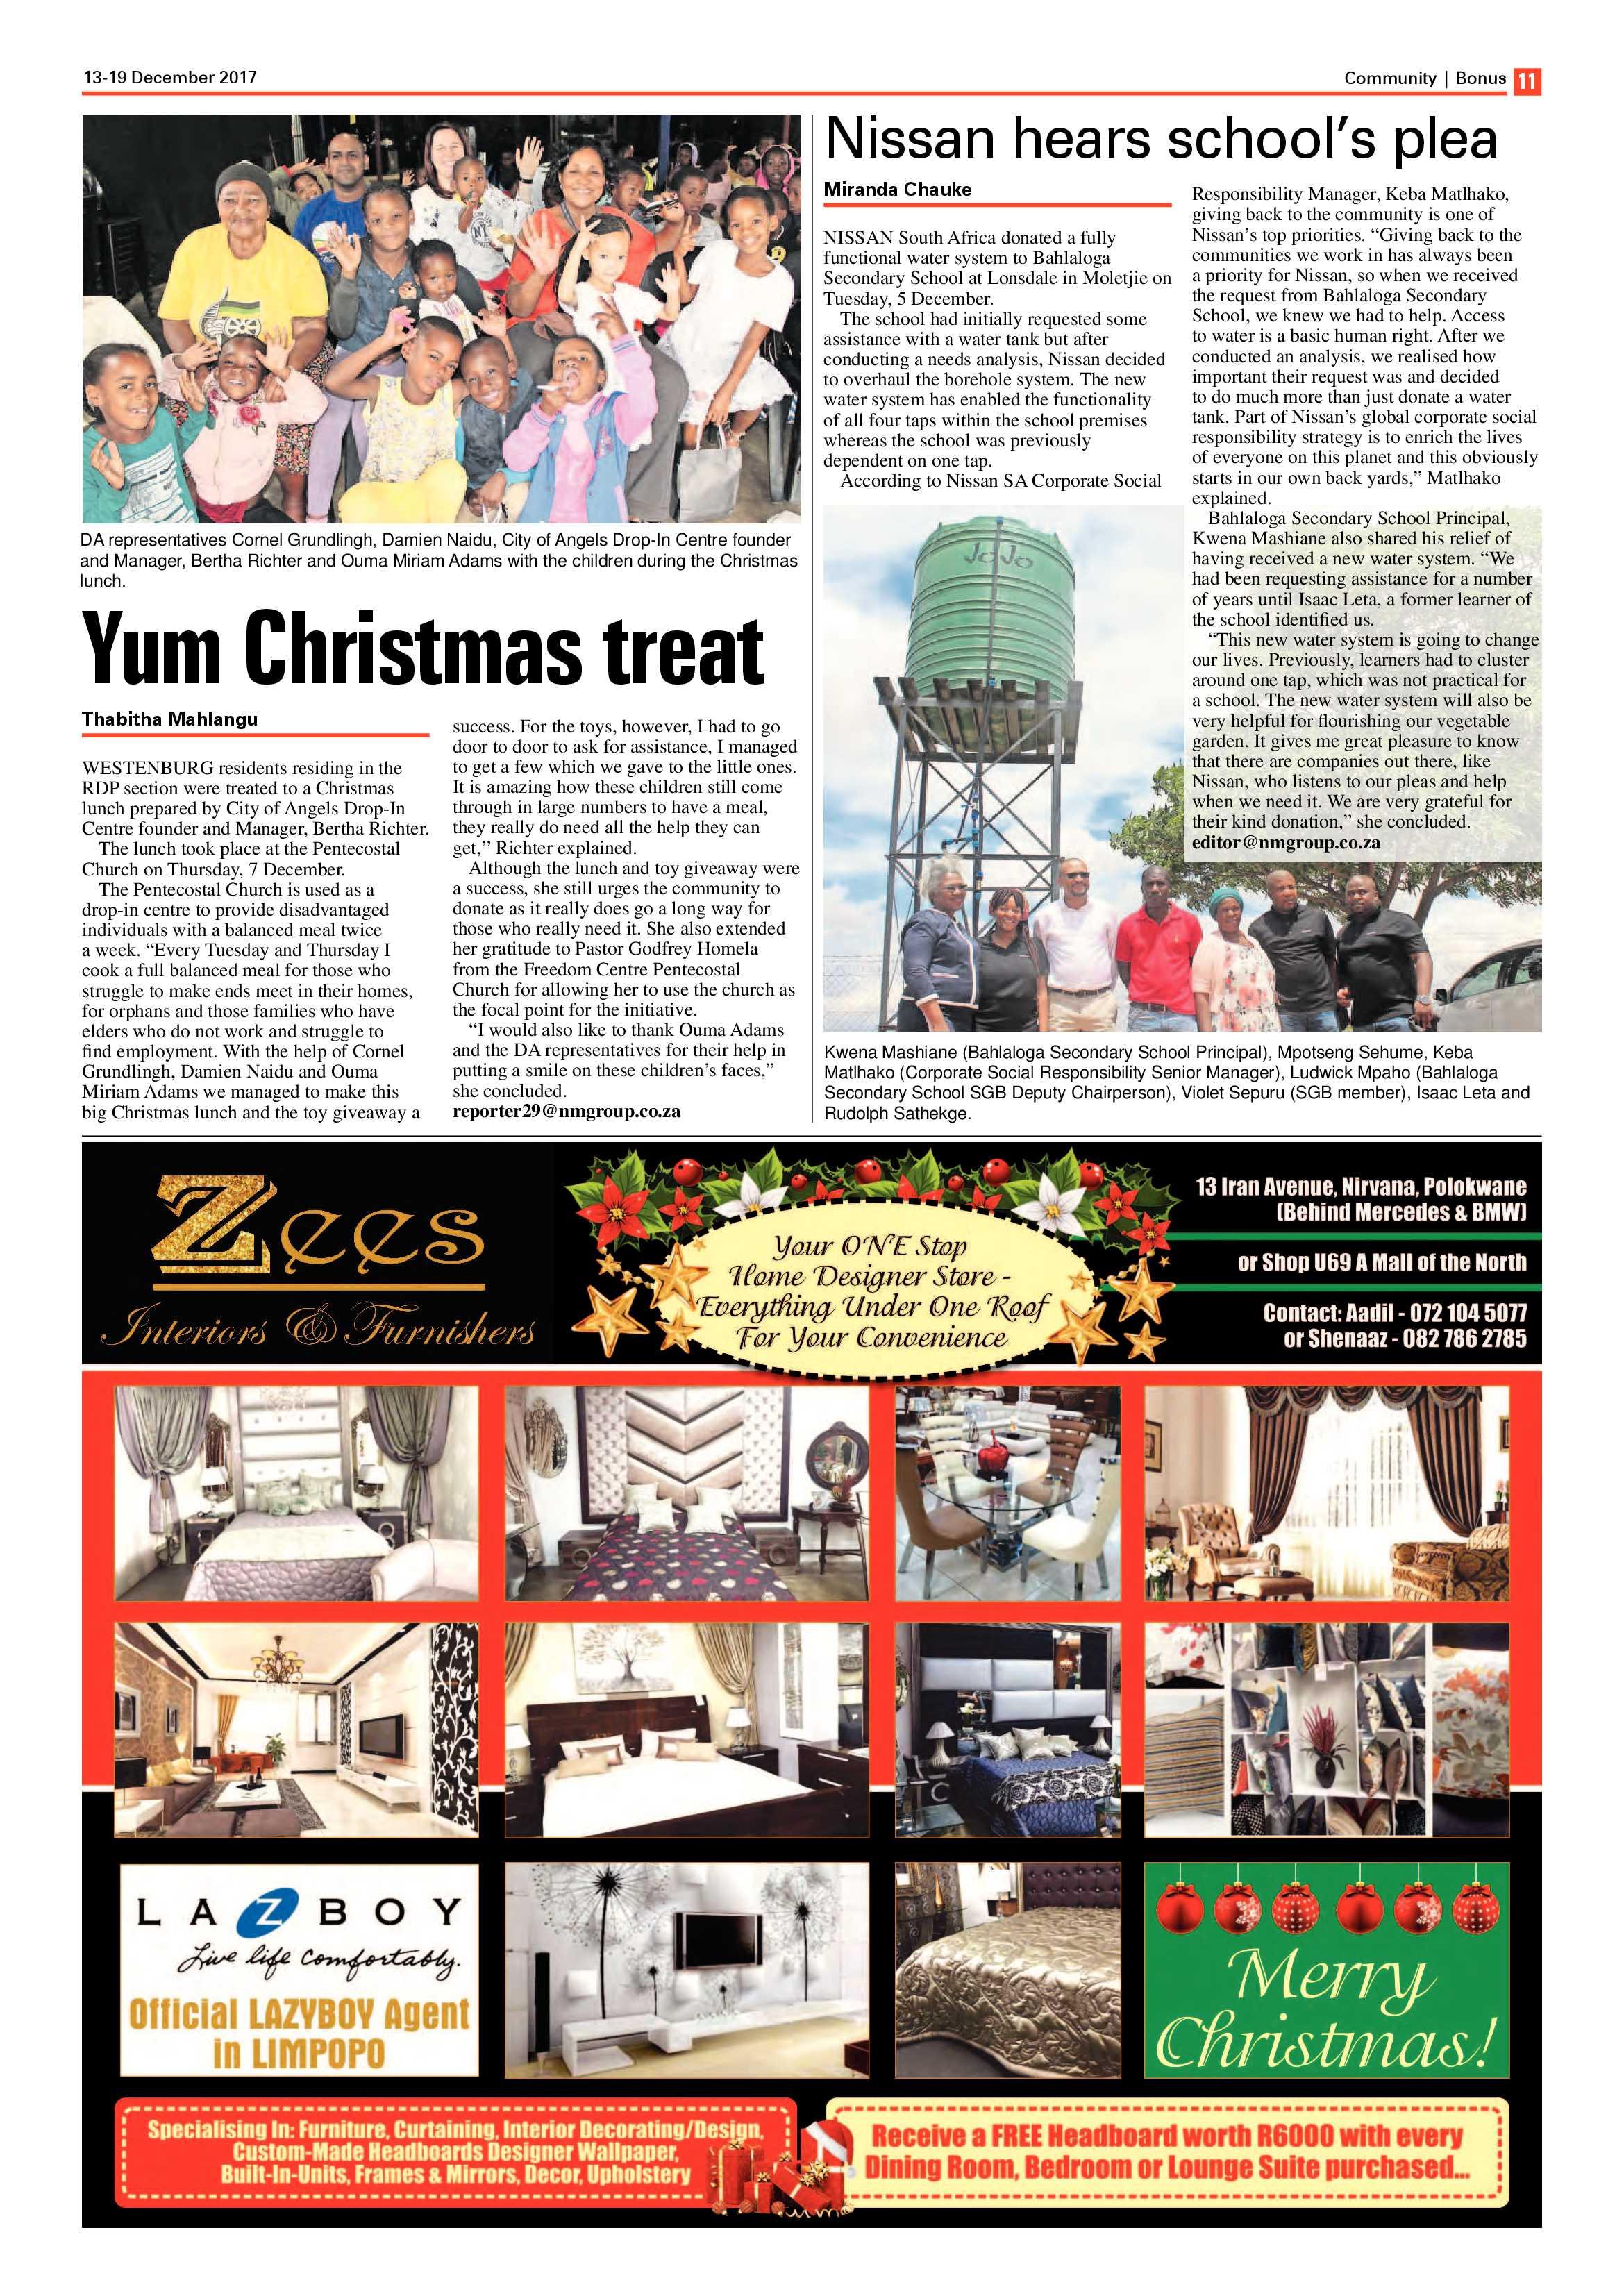 review-bonus-13-december-2017-epapers-page-11